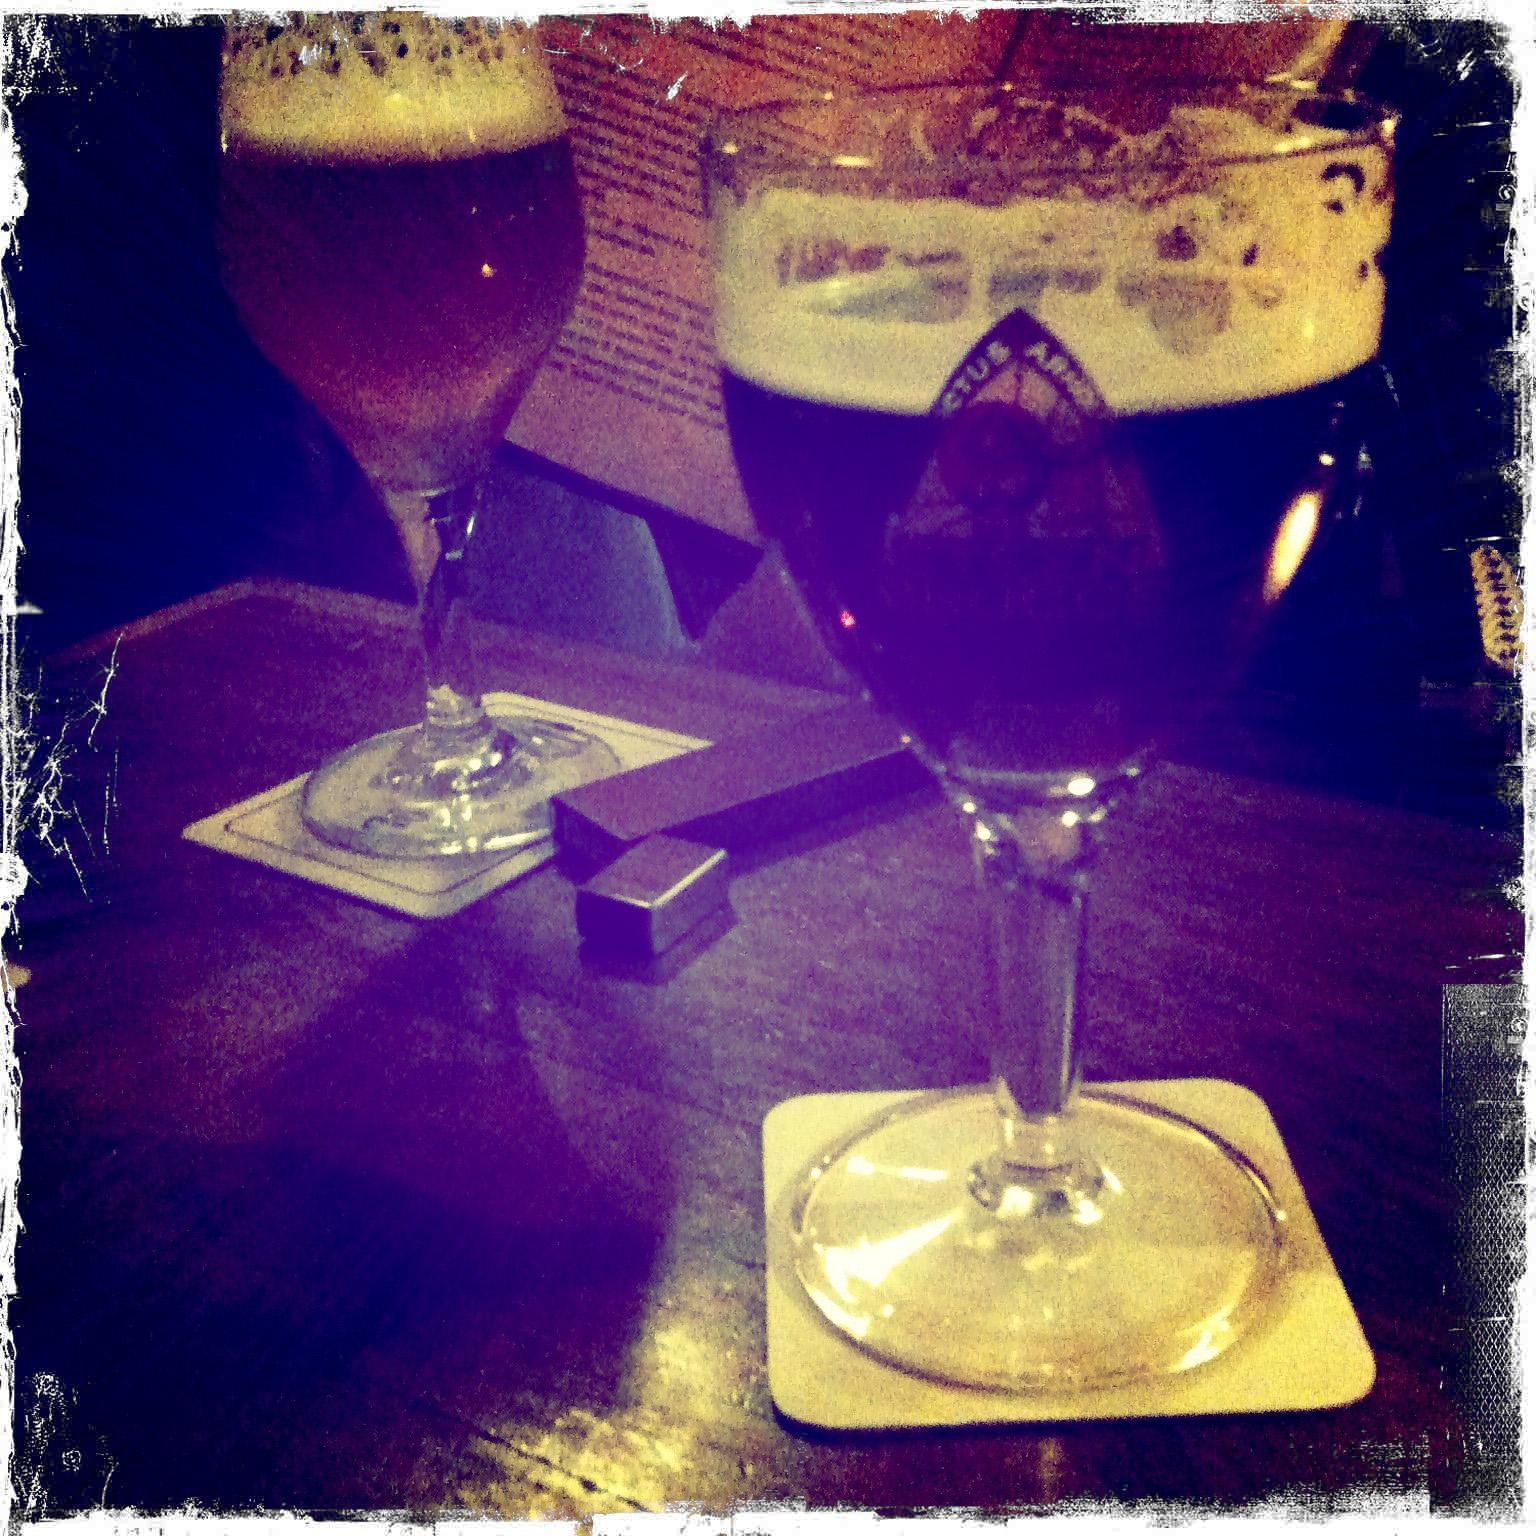 http://3.bp.blogspot.com/-PgGOjiv_TOk/TWZfPEXpzhI/AAAAAAAAAsY/LAmyasdiY6I/s1600/Amsterdam_Paris8.jpg